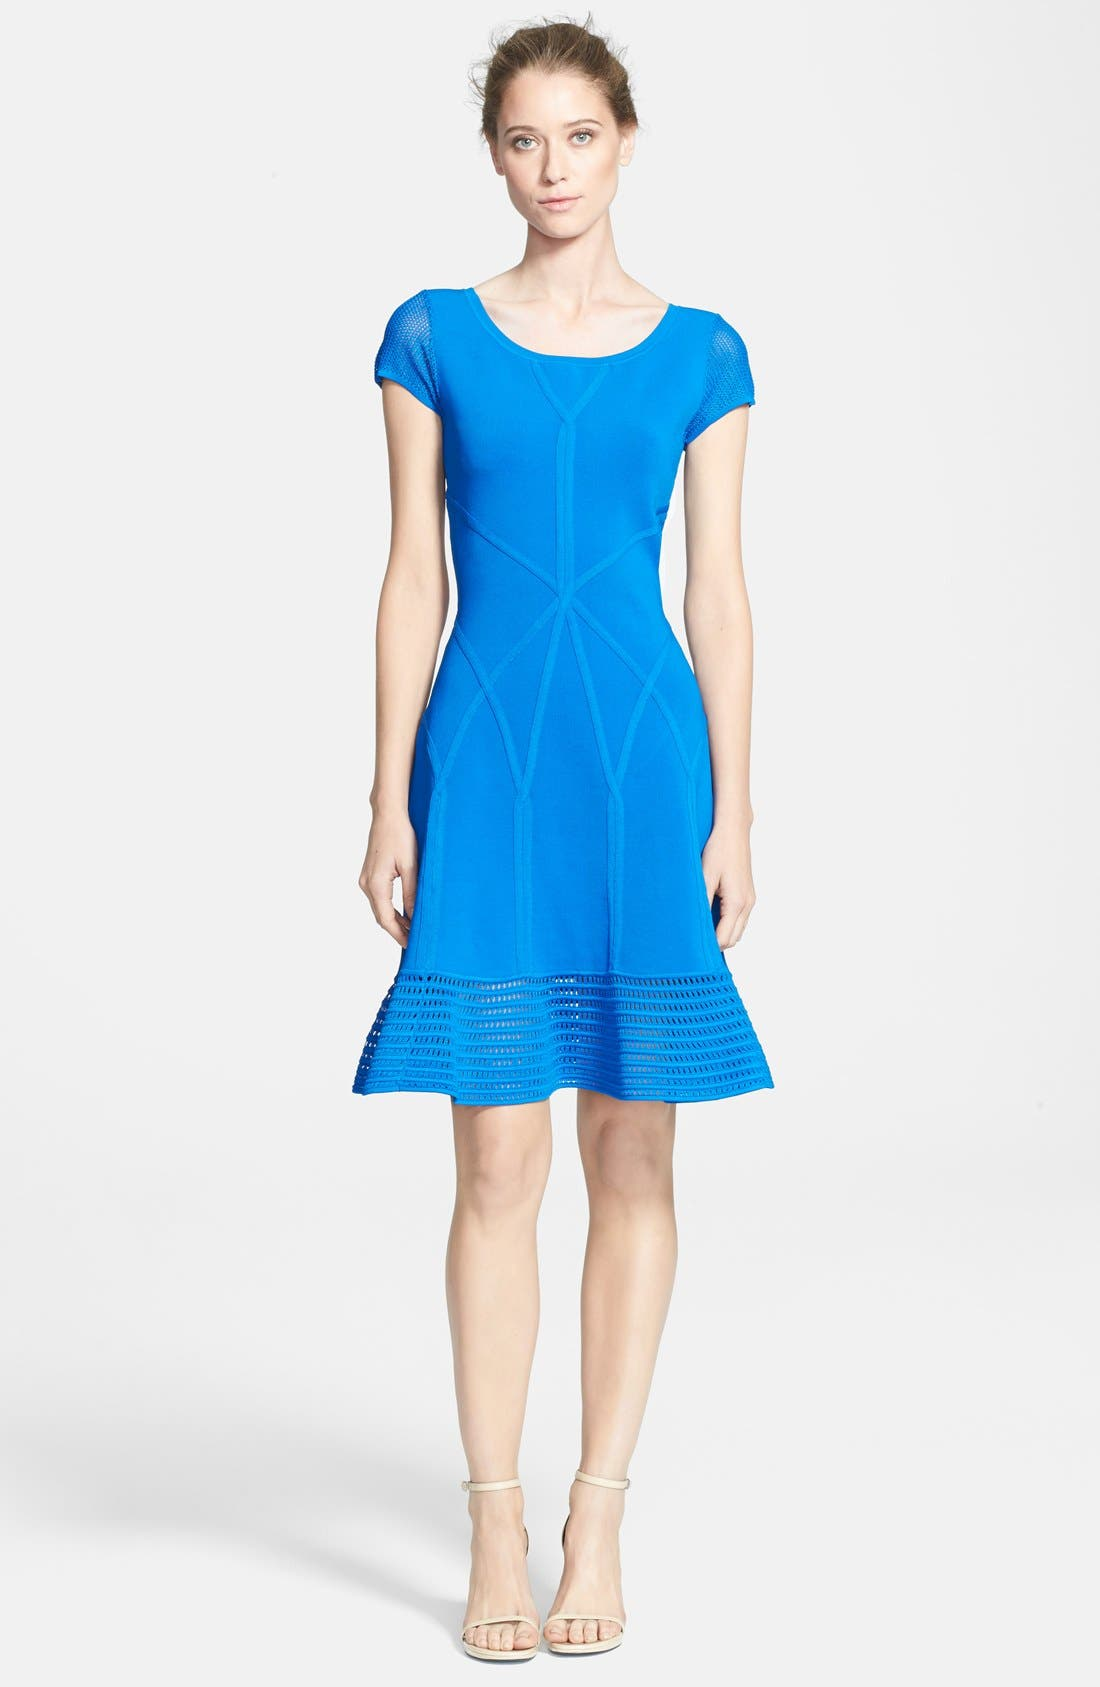 Alternate Image 1 Selected - Diane von Furstenberg 'St. Petersburg' Knit A-Line Dress